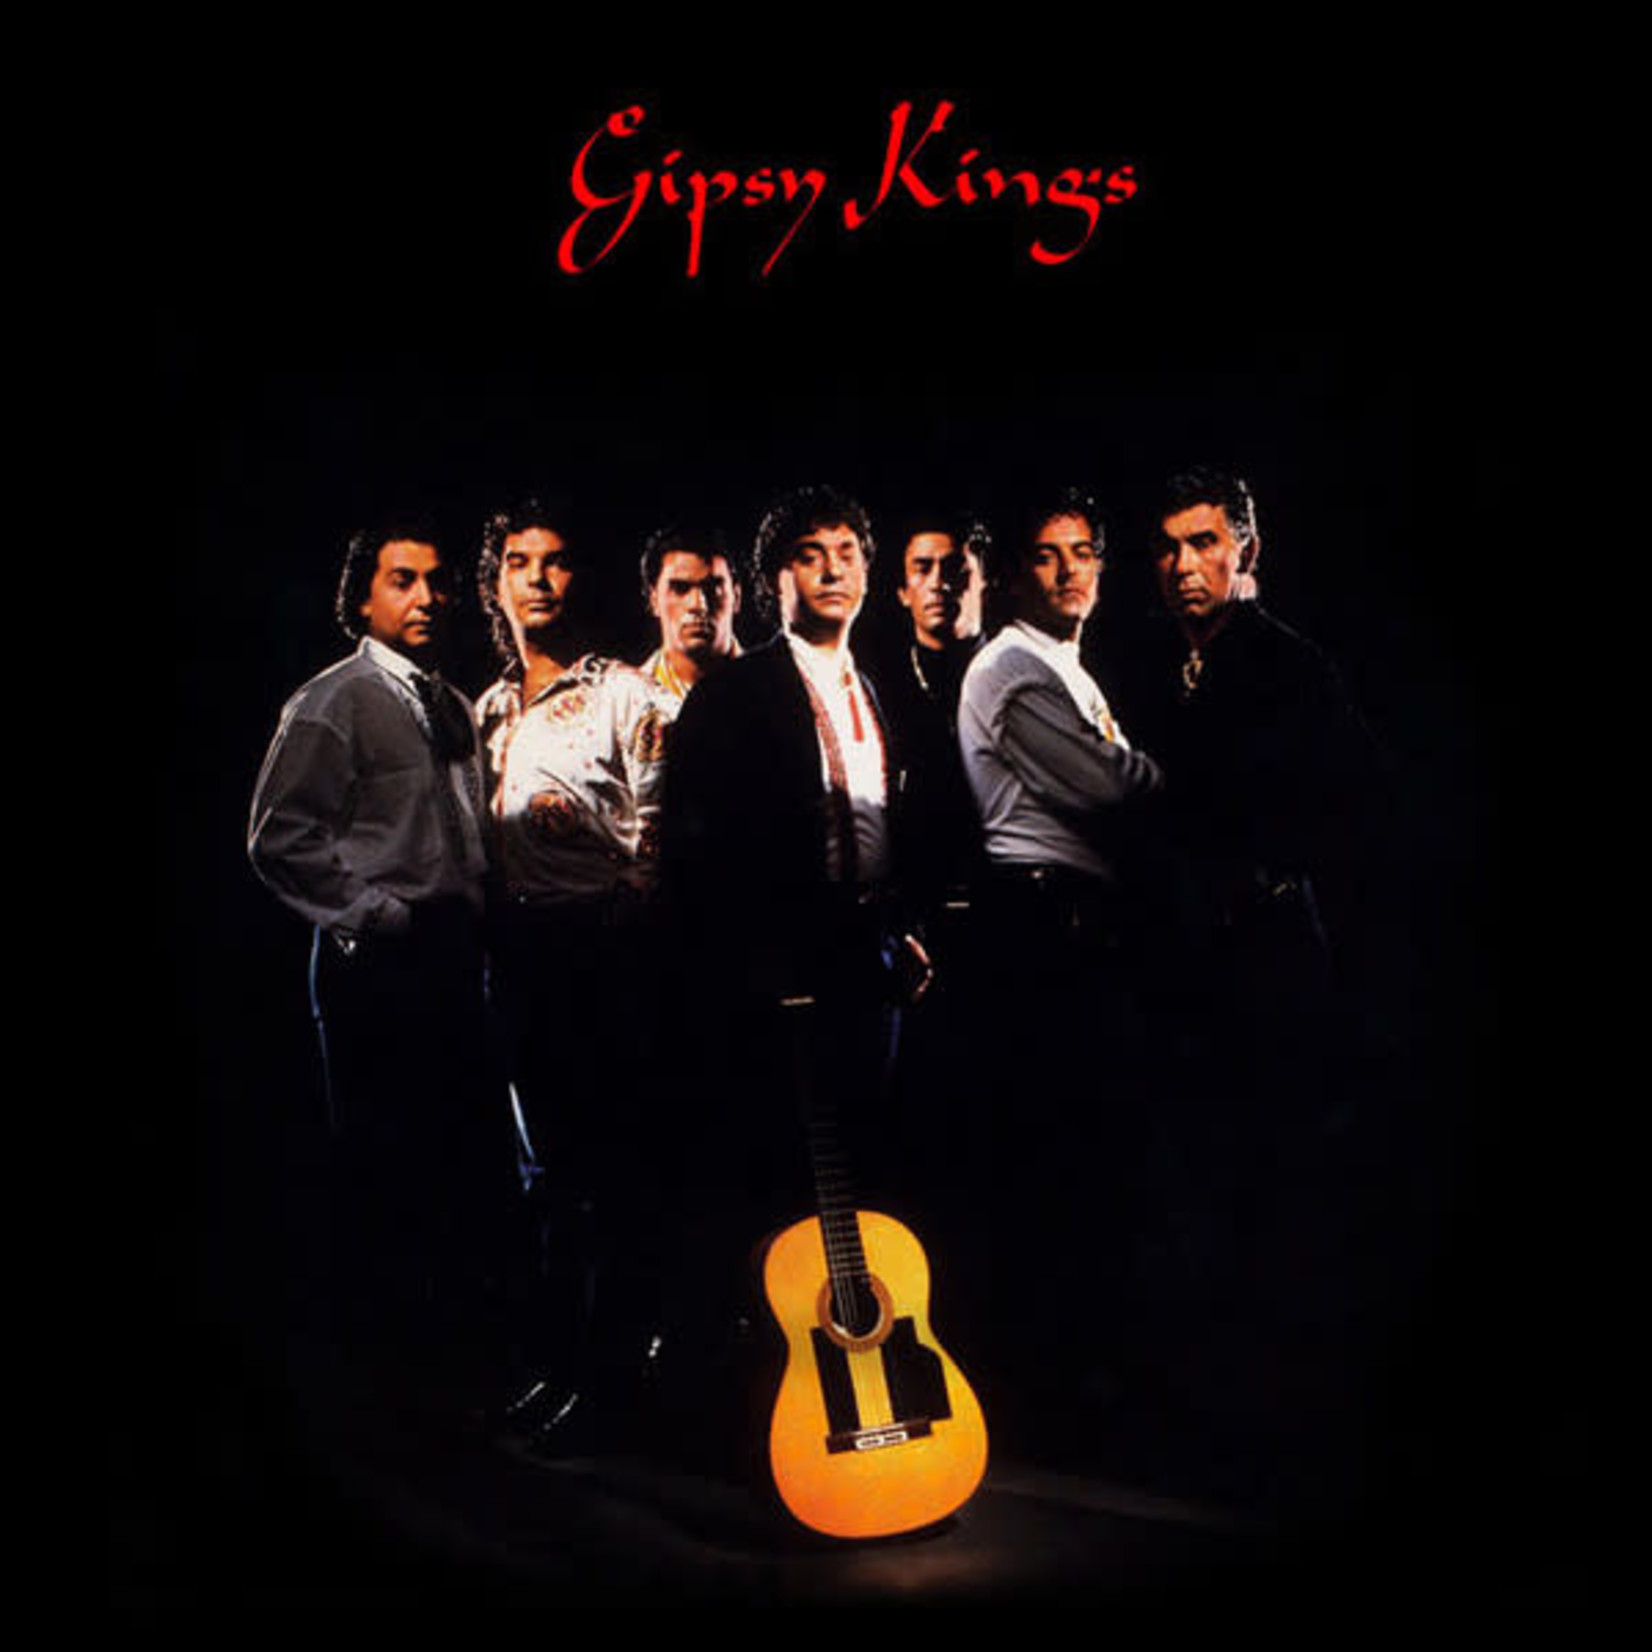 [Vintage] Gipsy Kings: self-titled